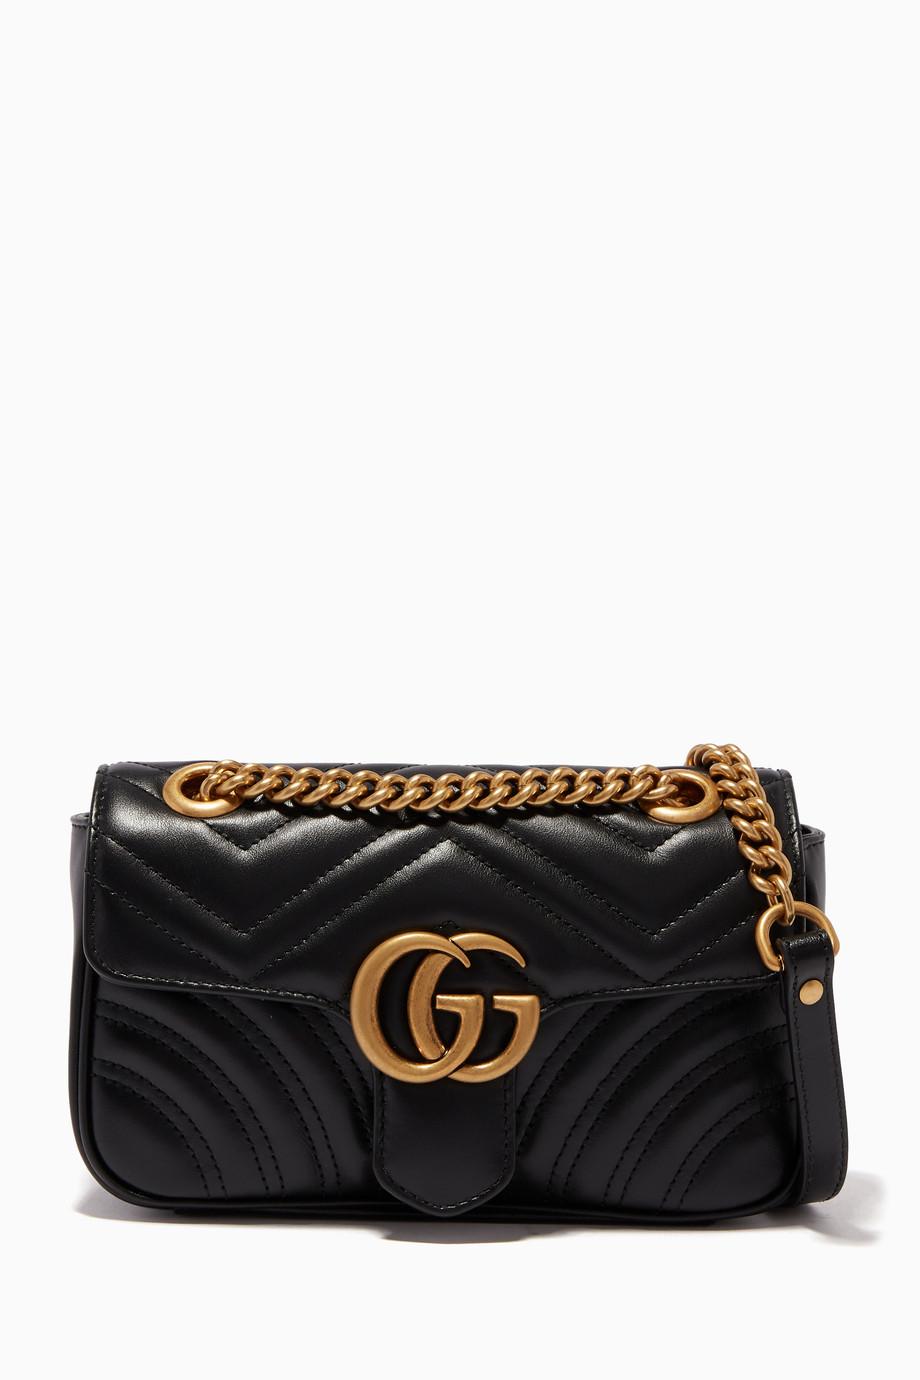 17c6f539e50 Shop Gucci Black Gucci Black Mini GG Marmont 2.0 Matelassé Shoulder ...